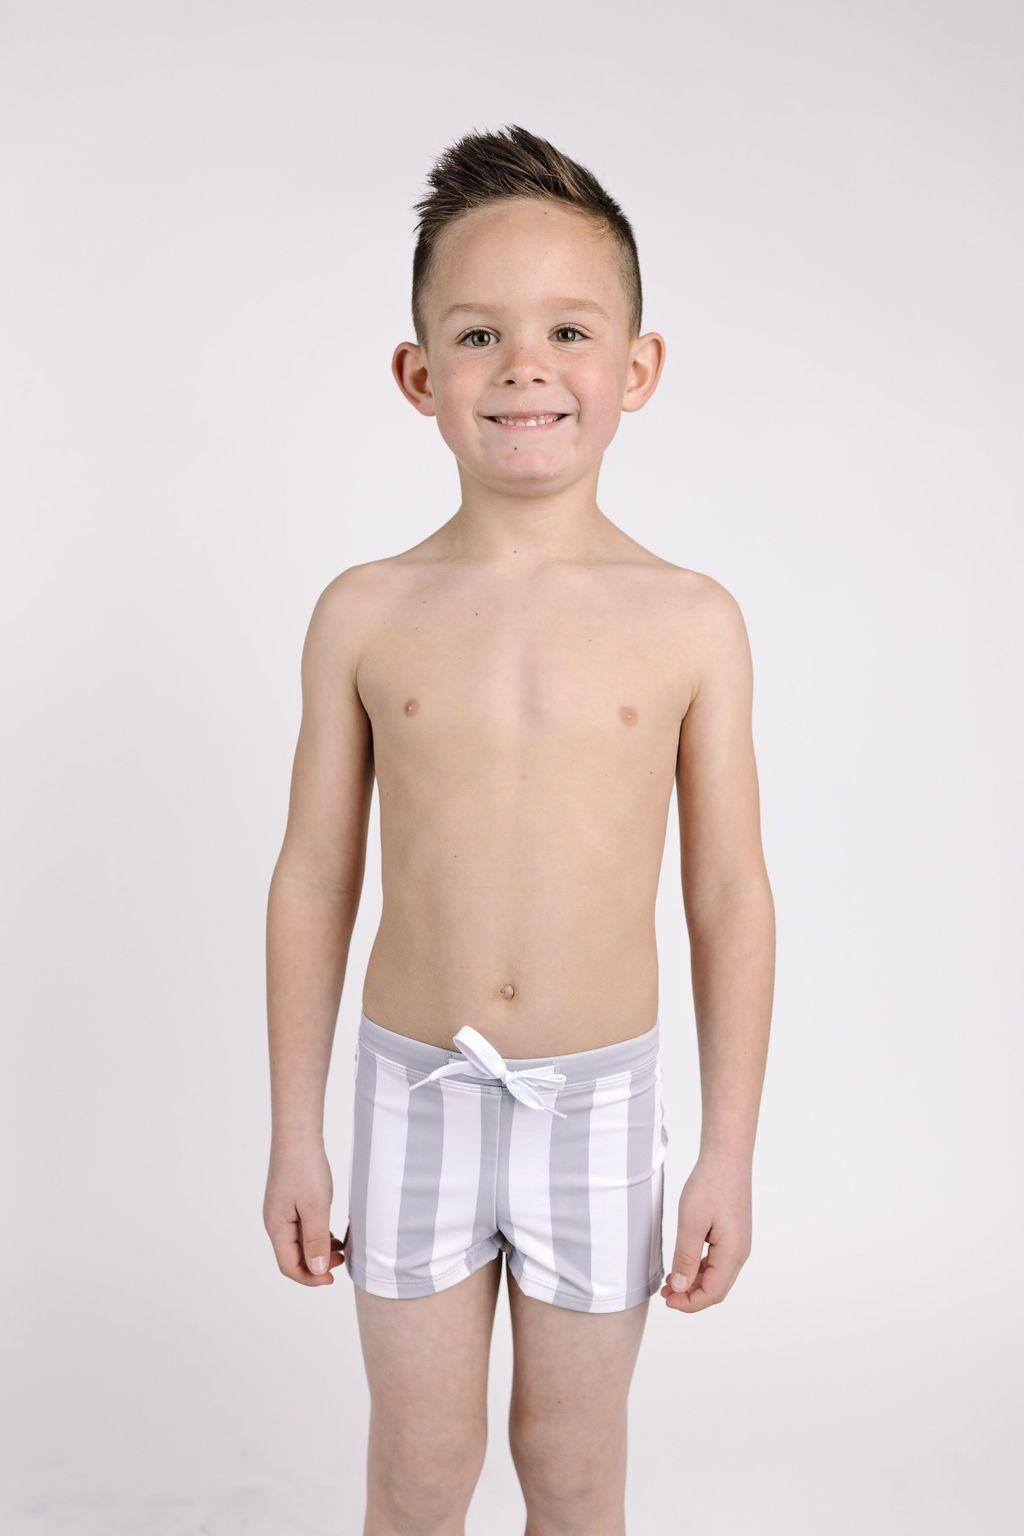 15d031aa03 Kortni jeane // kortni jeane swimmers // swimwear // swimsuits // little